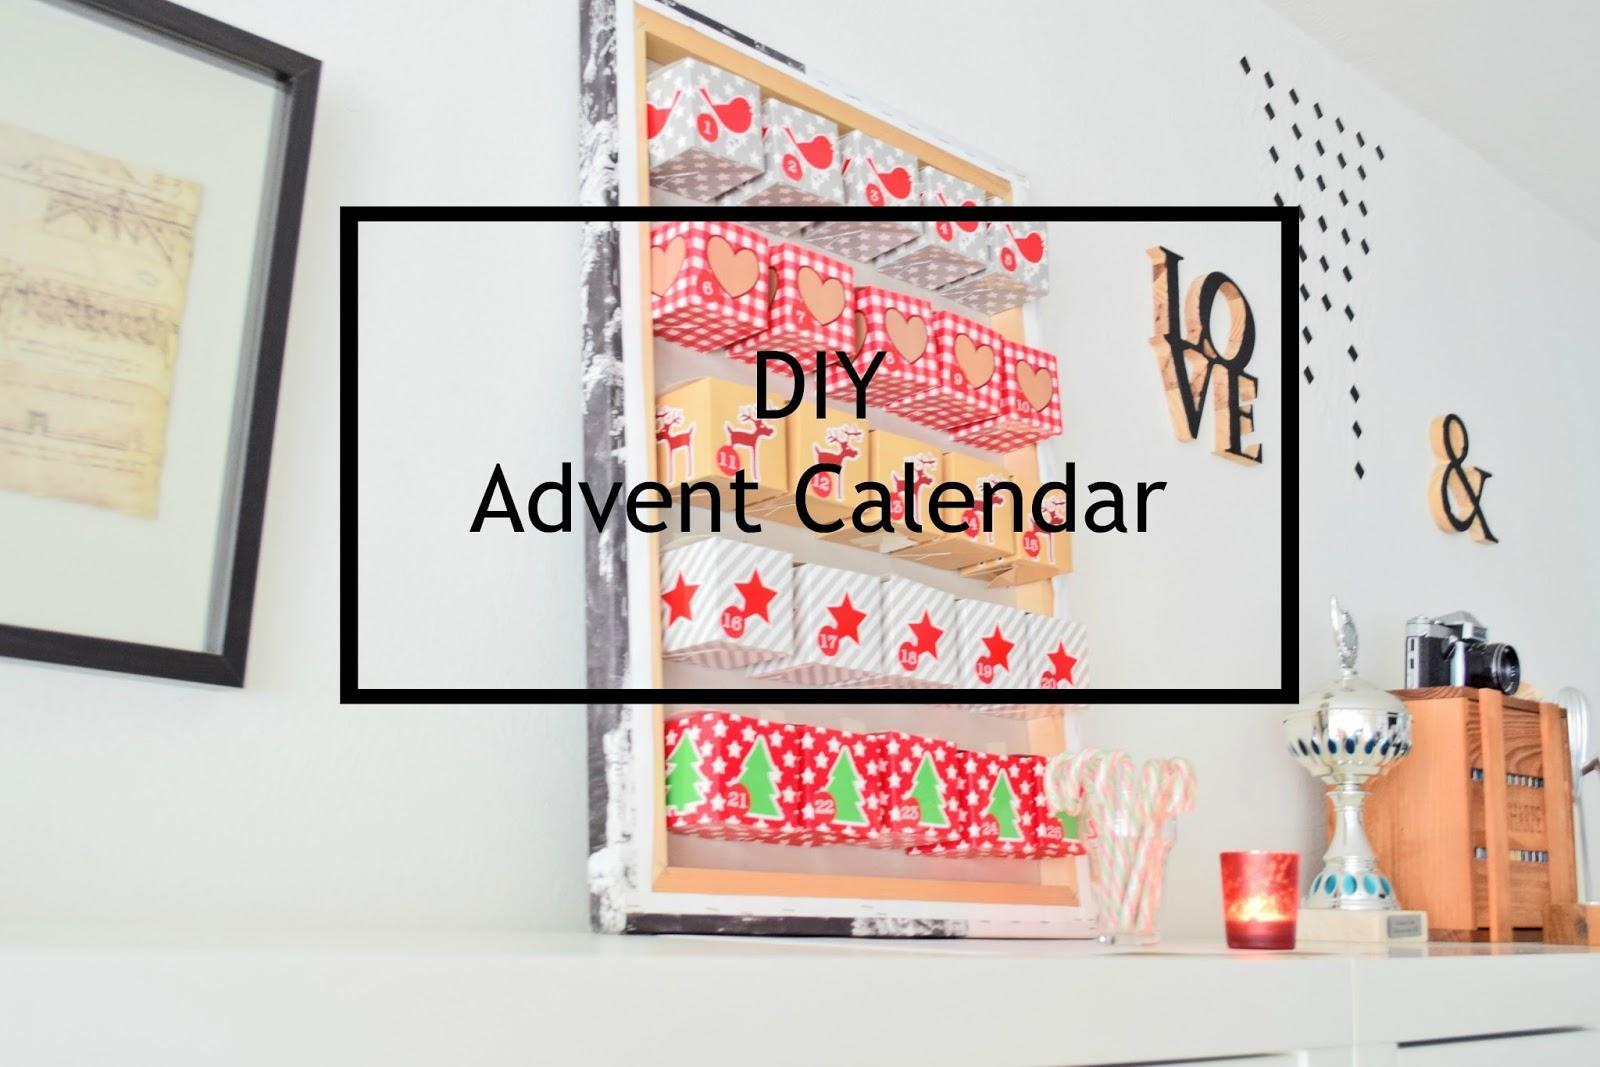 DIY Adventskalender!